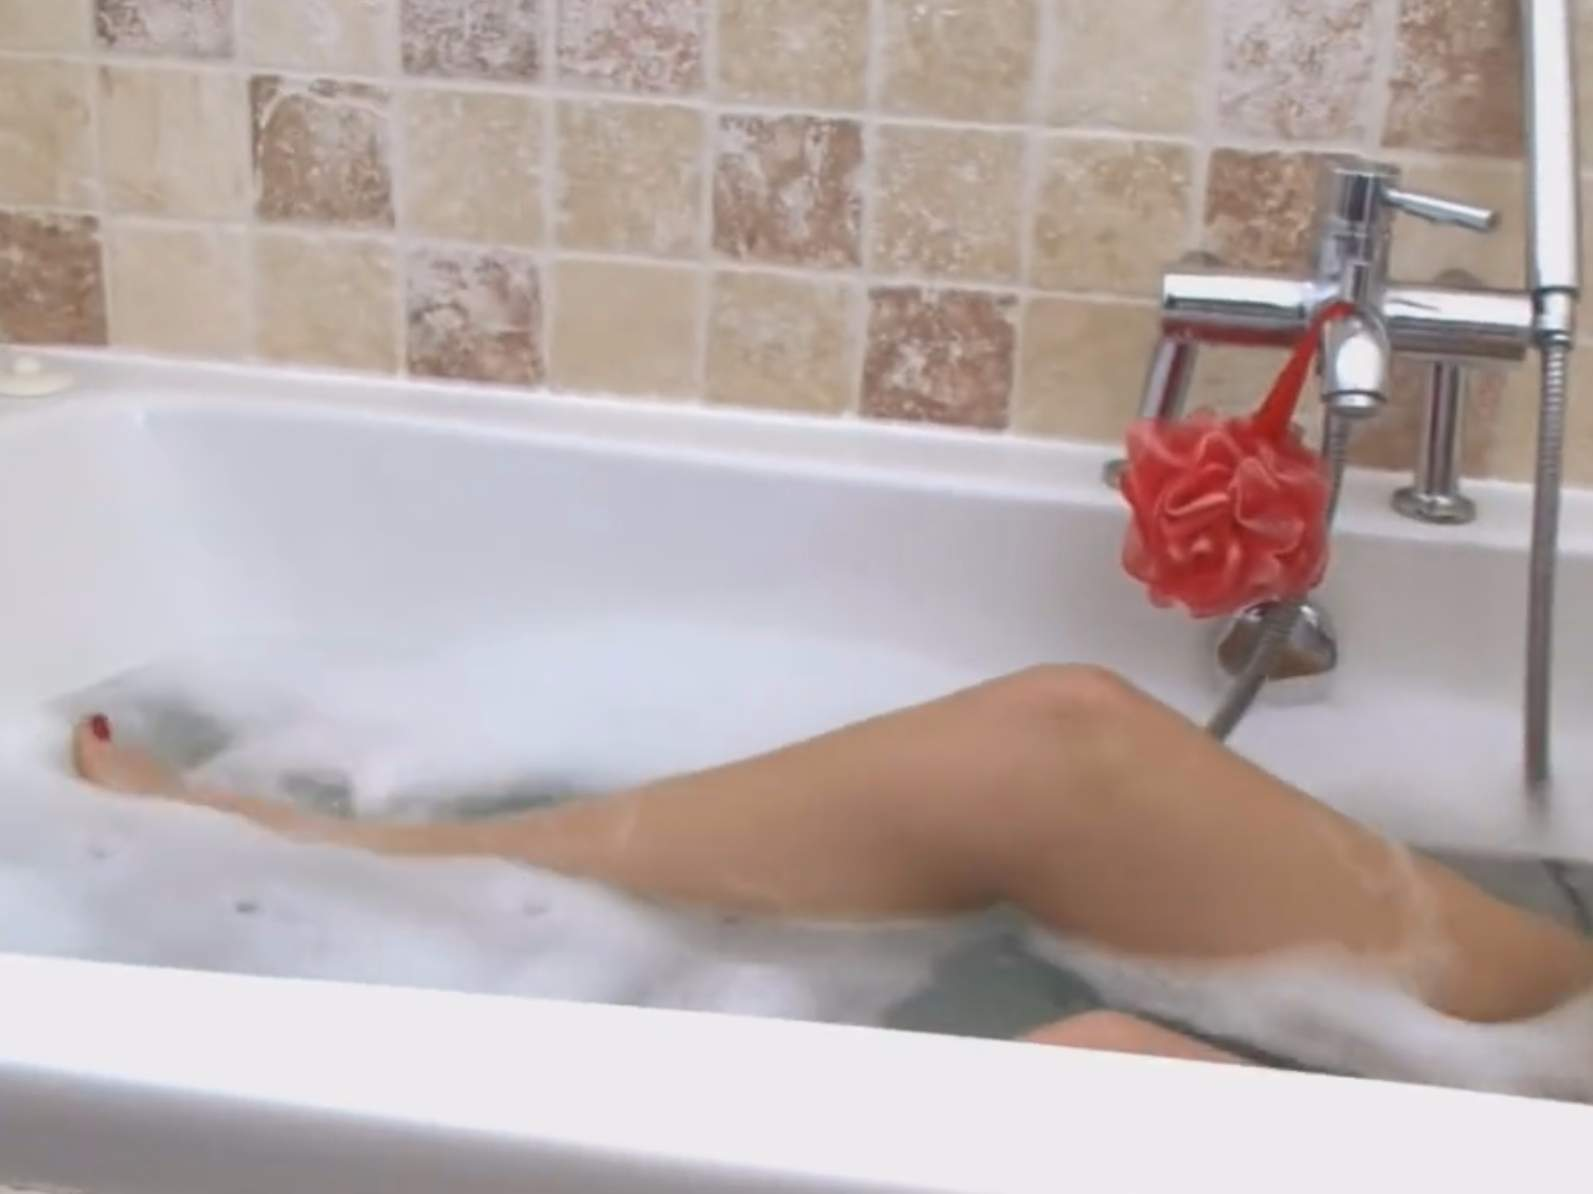 rajce.idnes bath Rajce Idnes Img Bath A   Joss Picture Cam